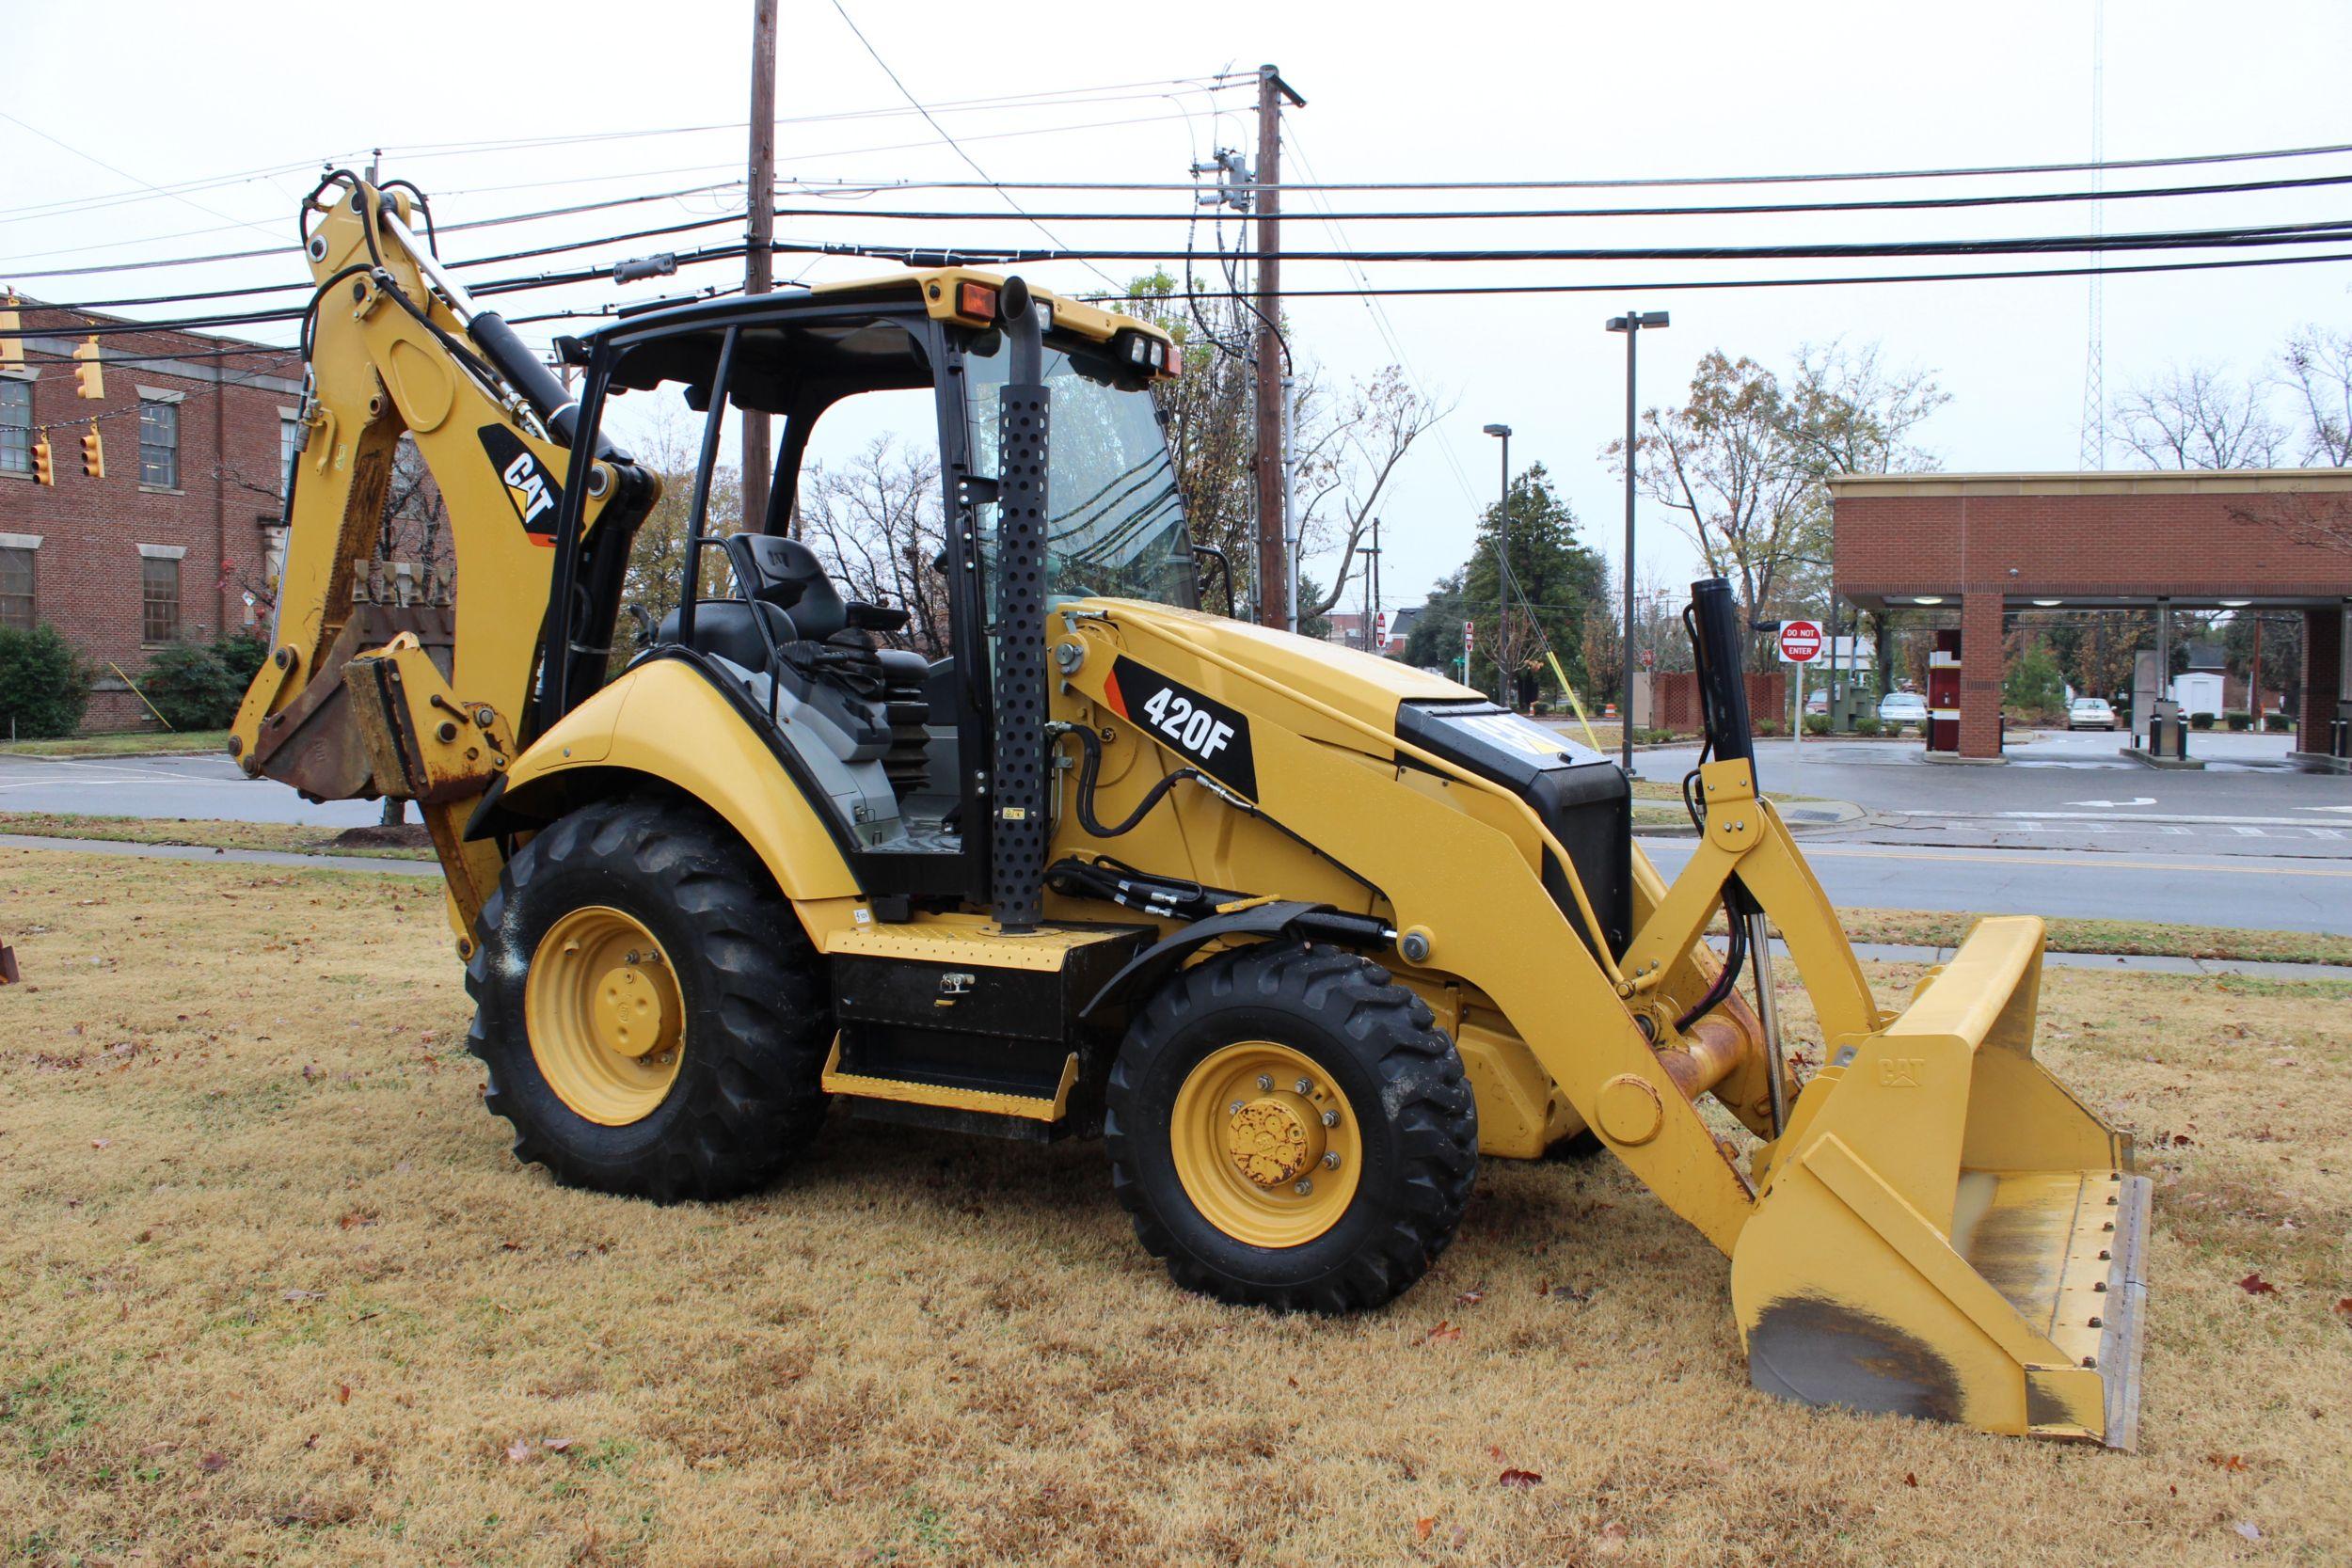 Donated Cat® Machines Help Restore Order After Hurricane Matthew